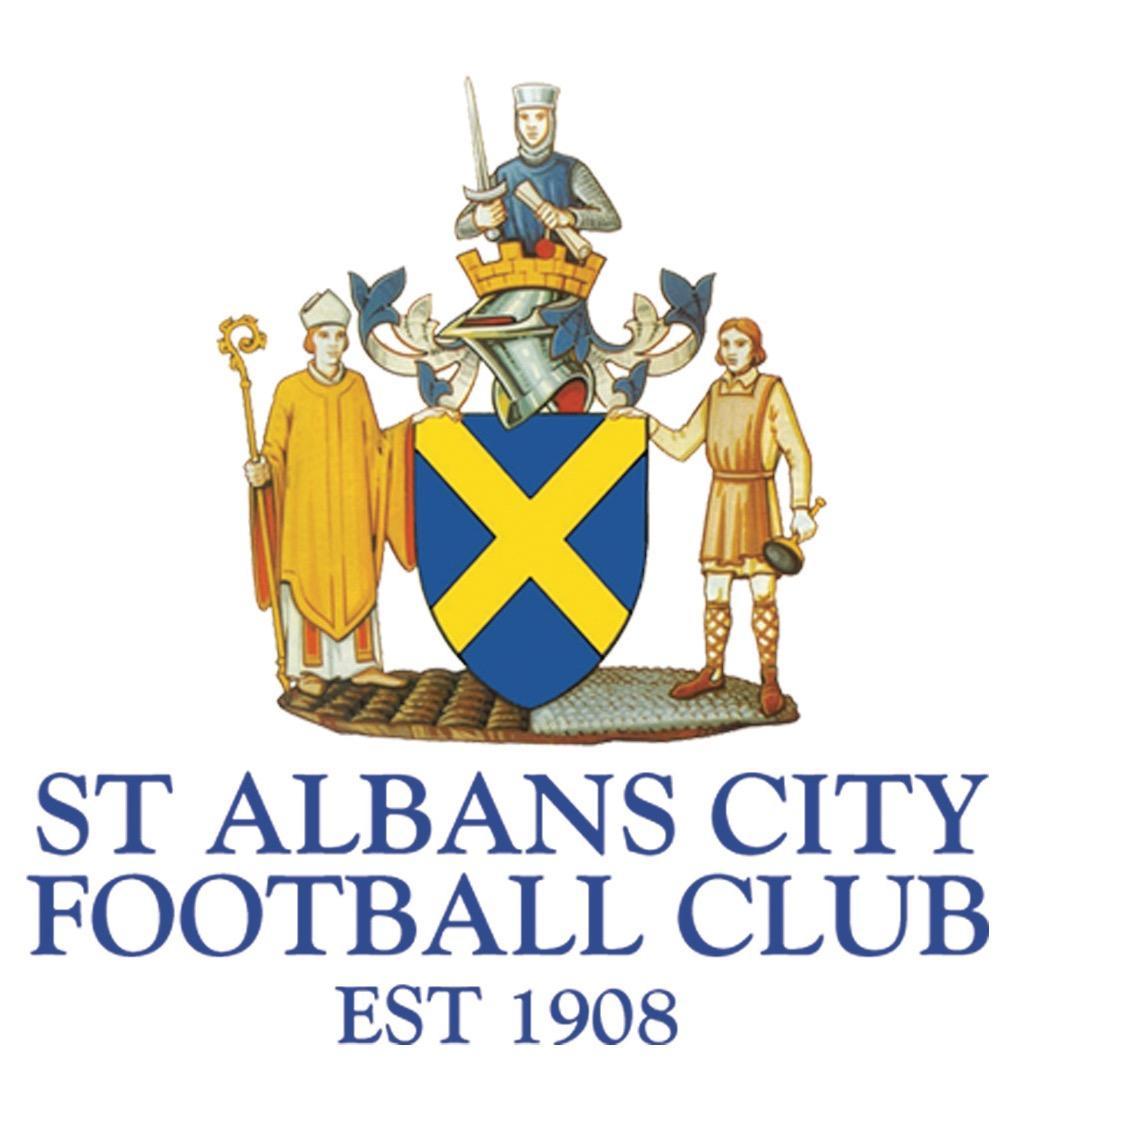 St Albans city football club logo